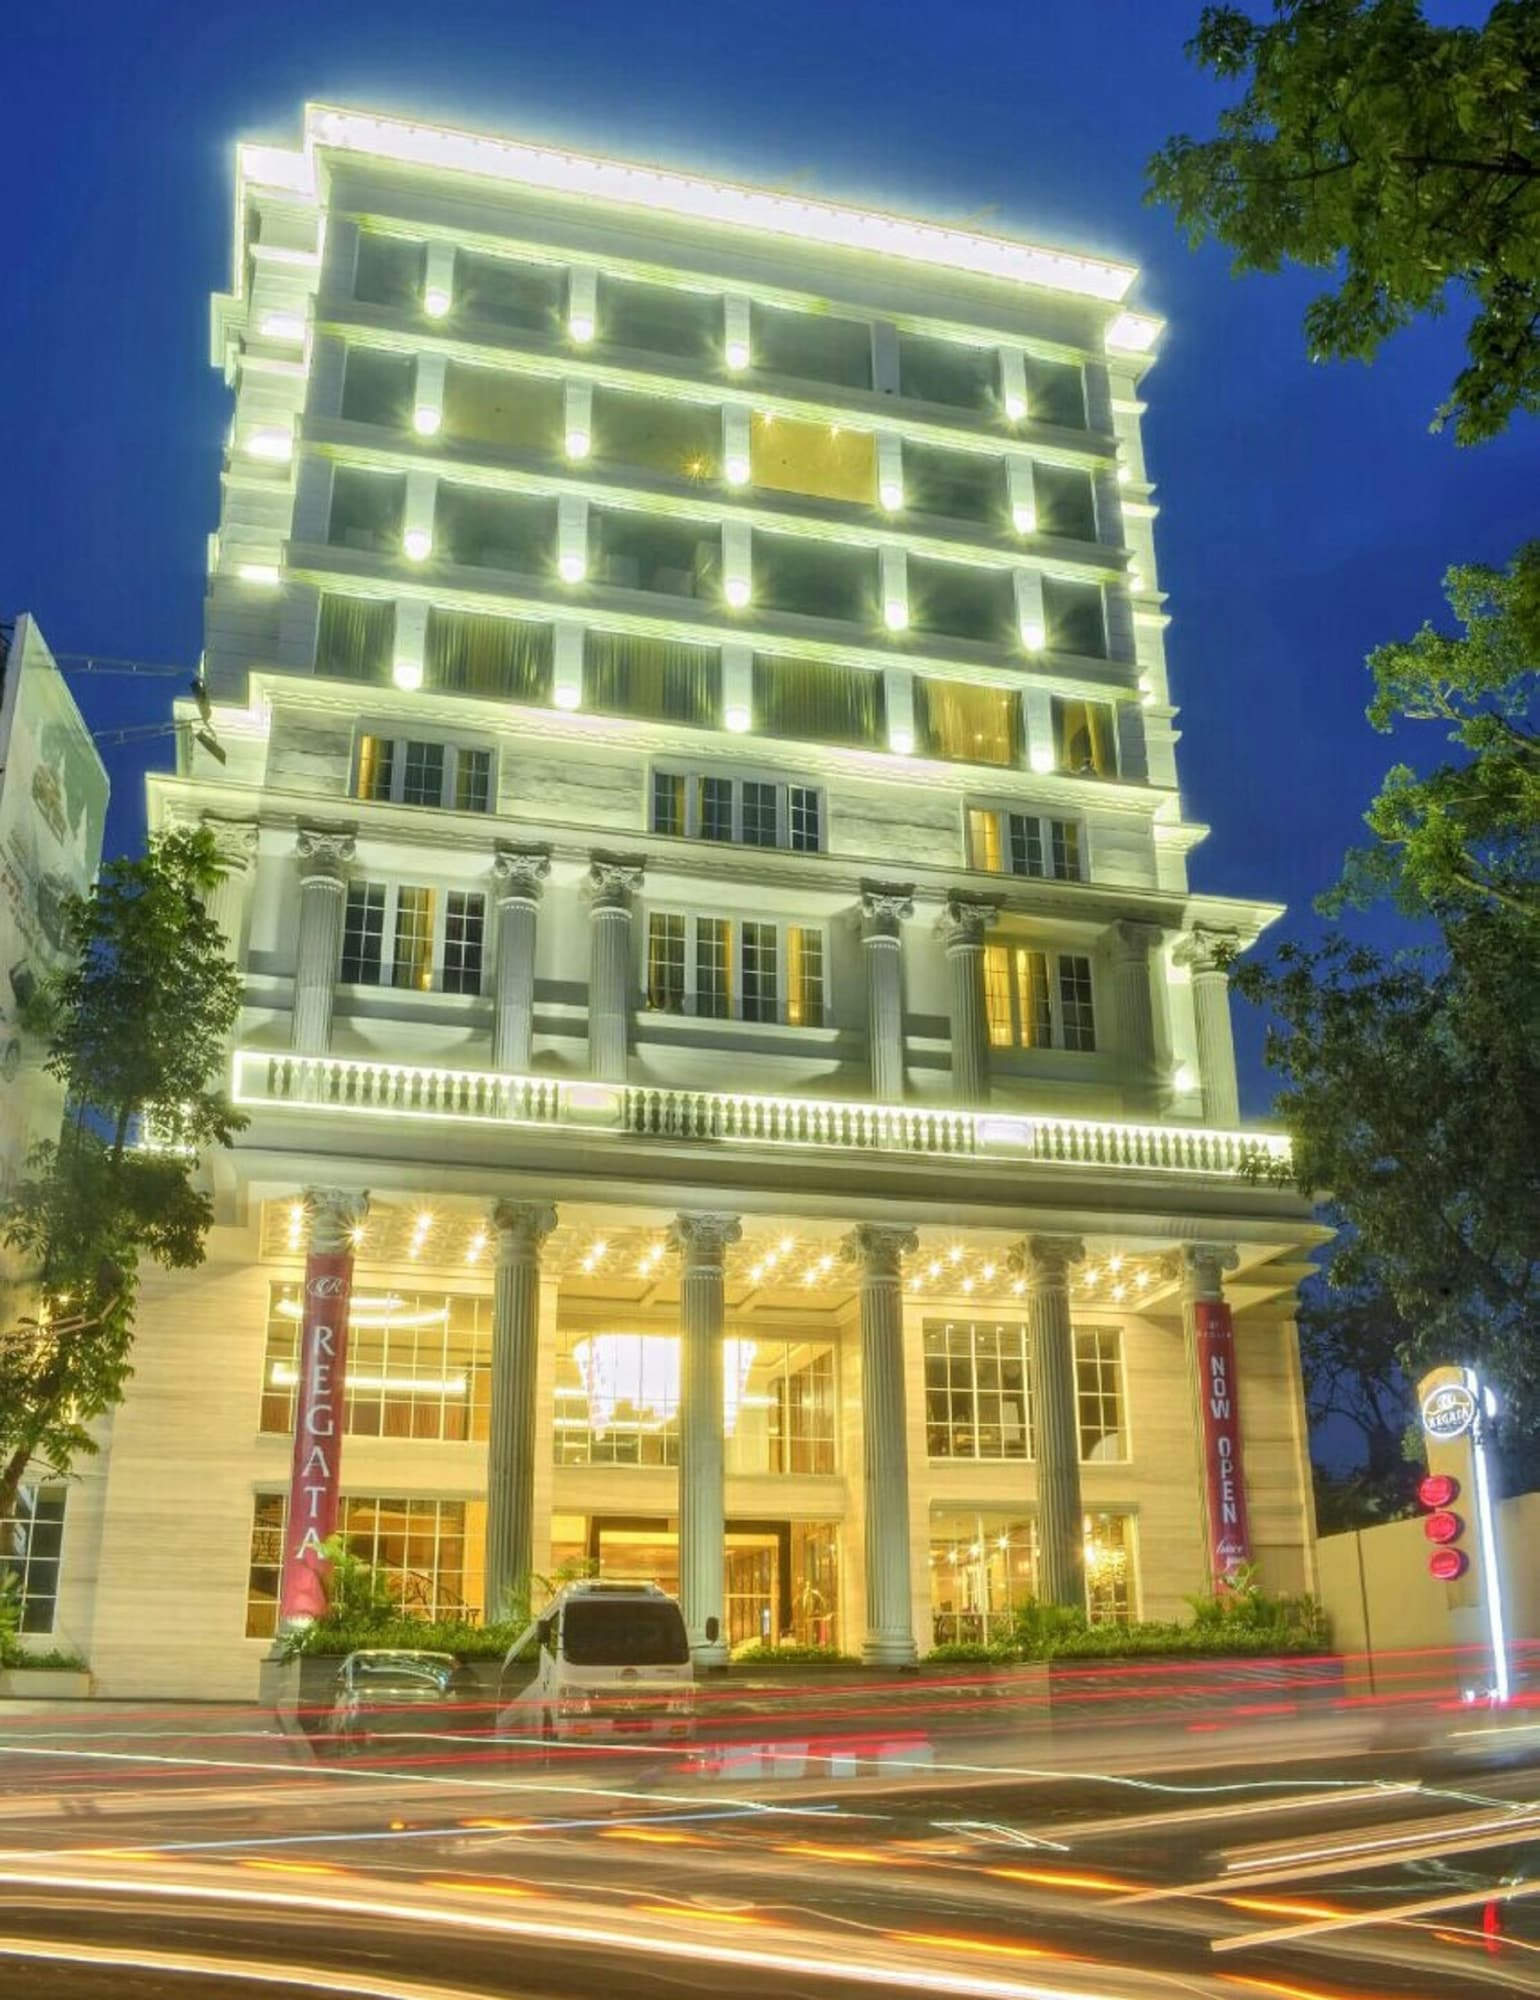 Belviu Hotel (Formerly Regata Hotel), Bandung